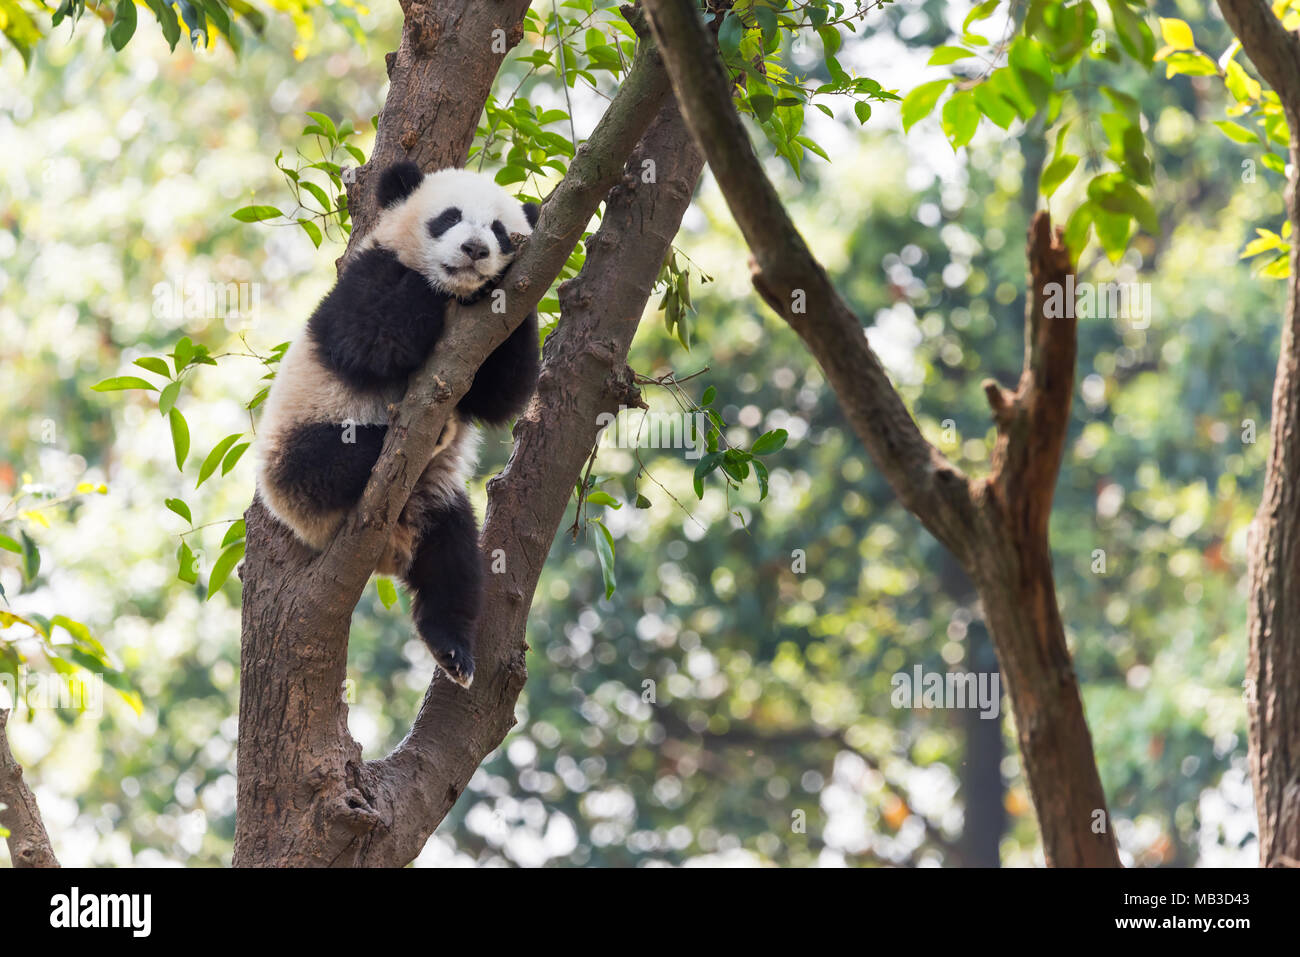 Panda cub sleeping in a tree, Chengdu, China Stock Photo